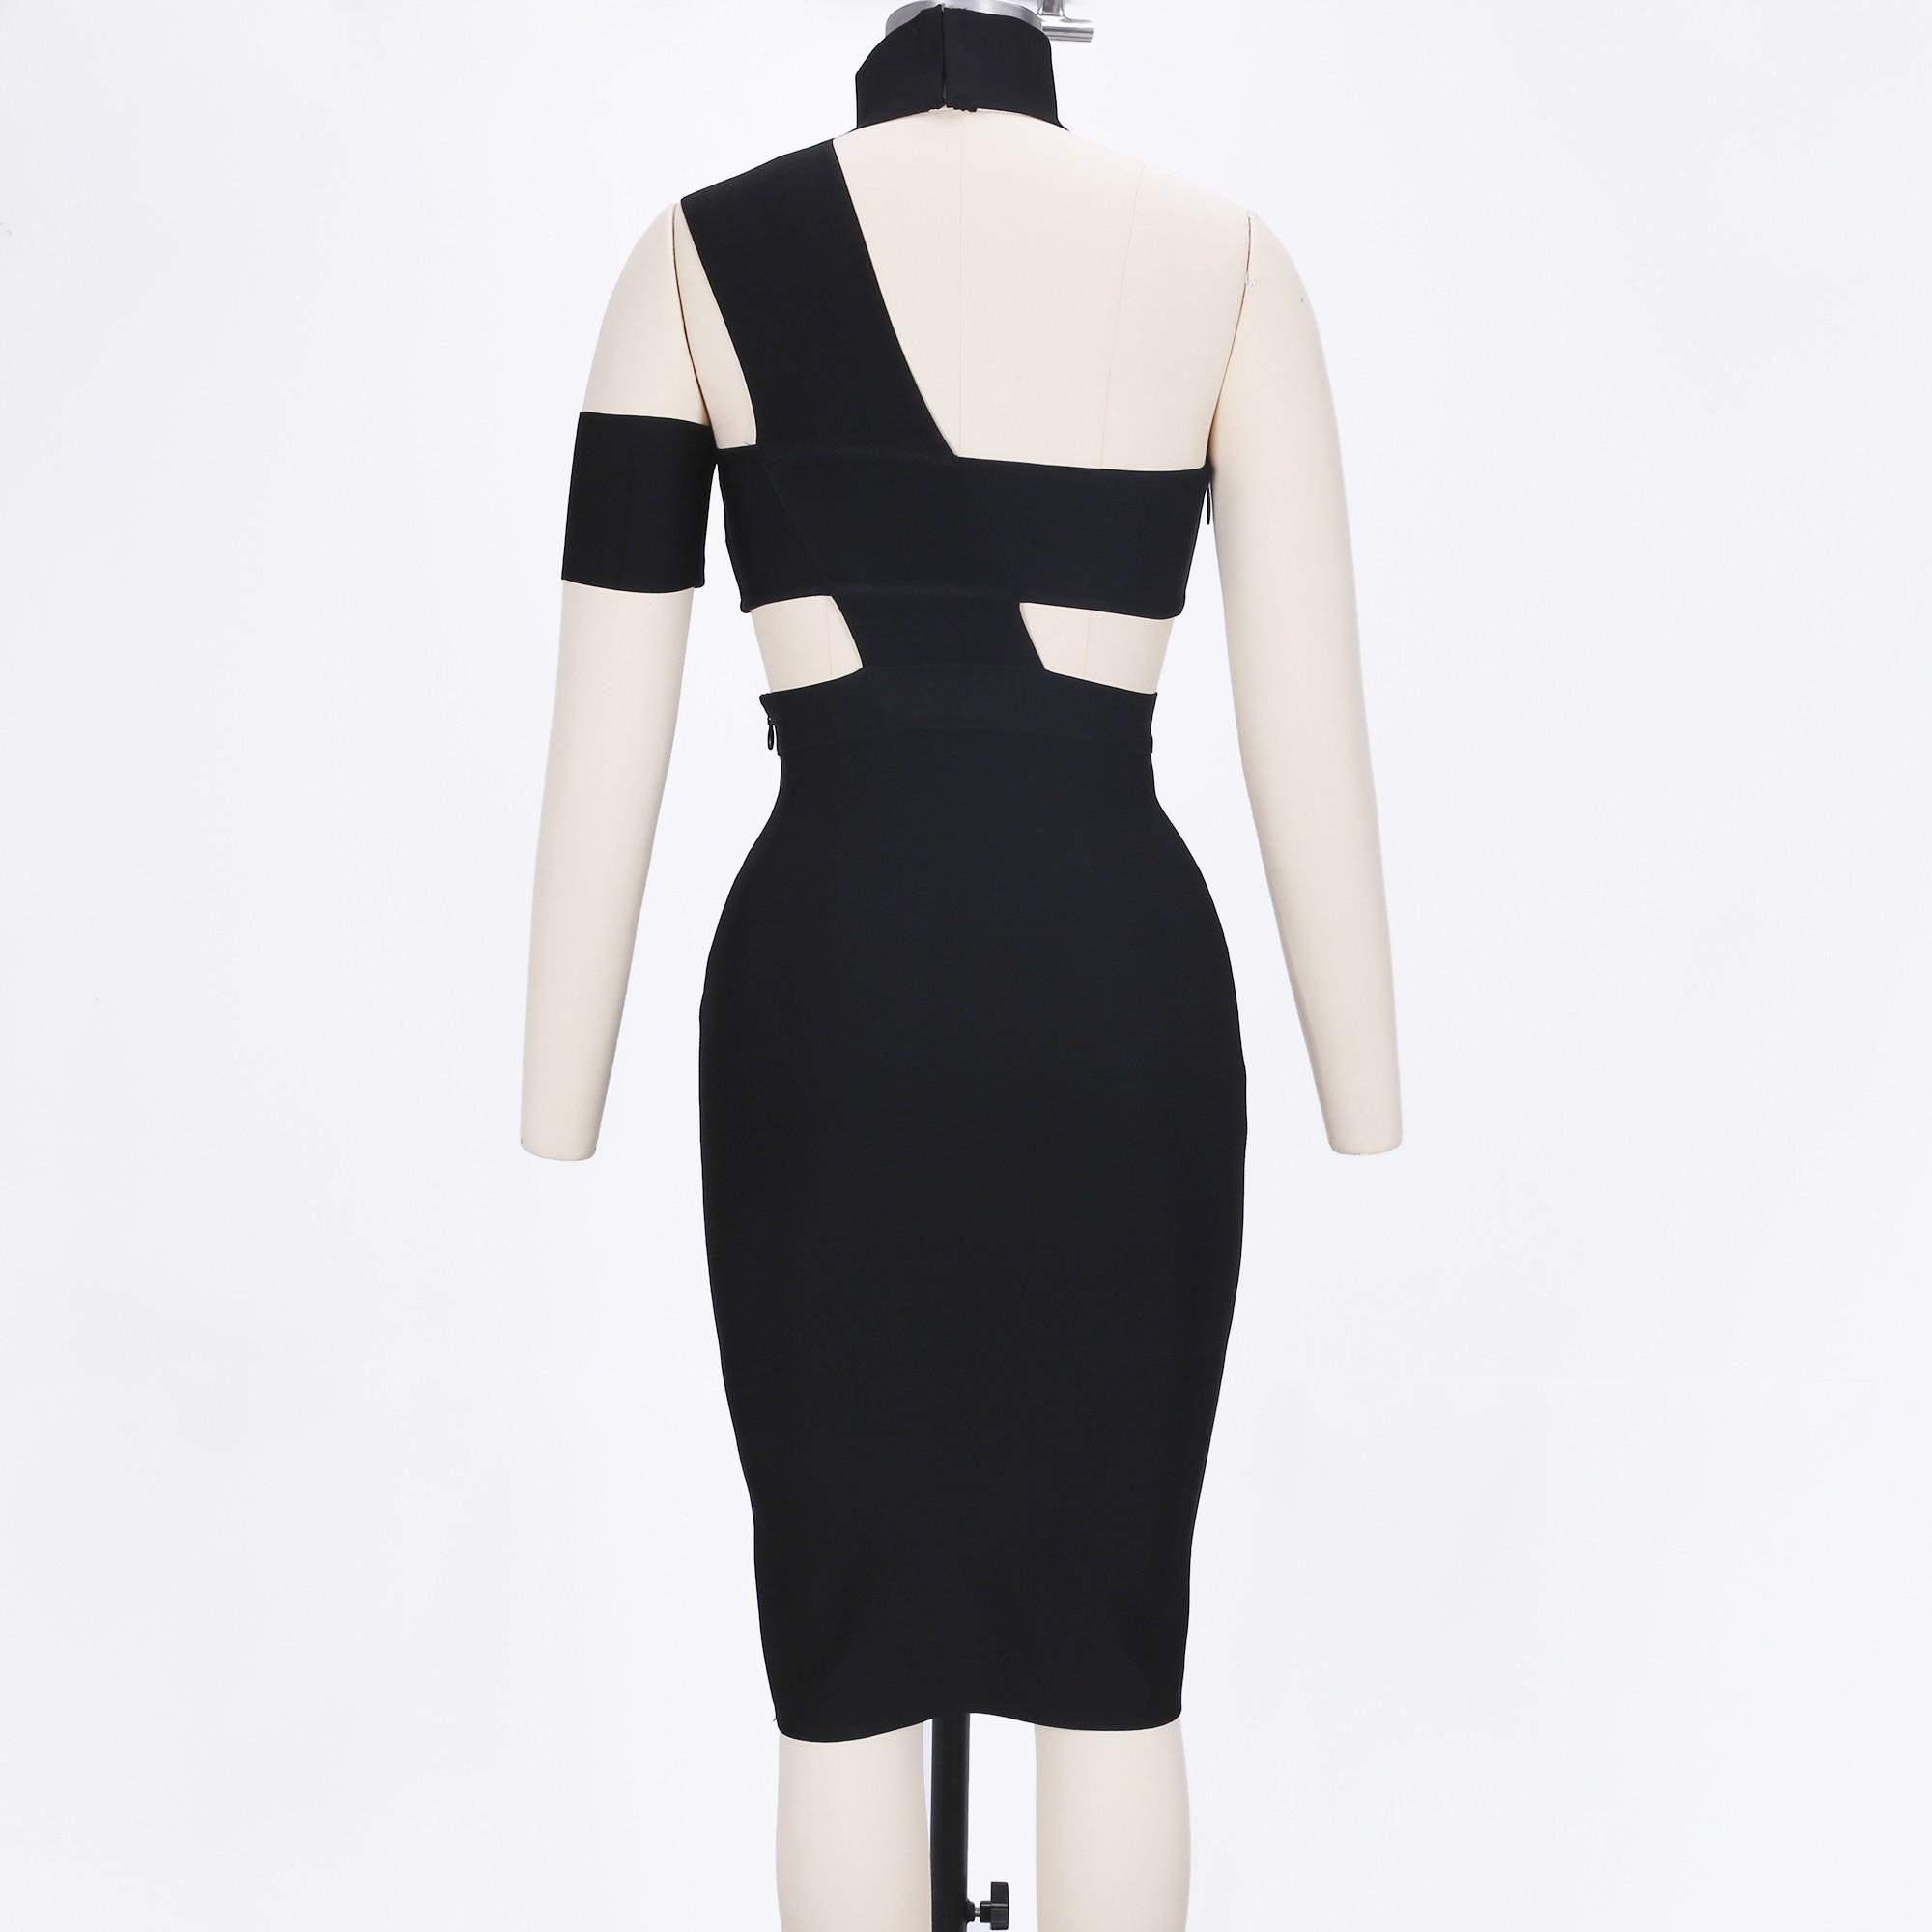 Halter Sleeveless Knee length Cutout Black Fashion Bandage dress SP015-BLACK